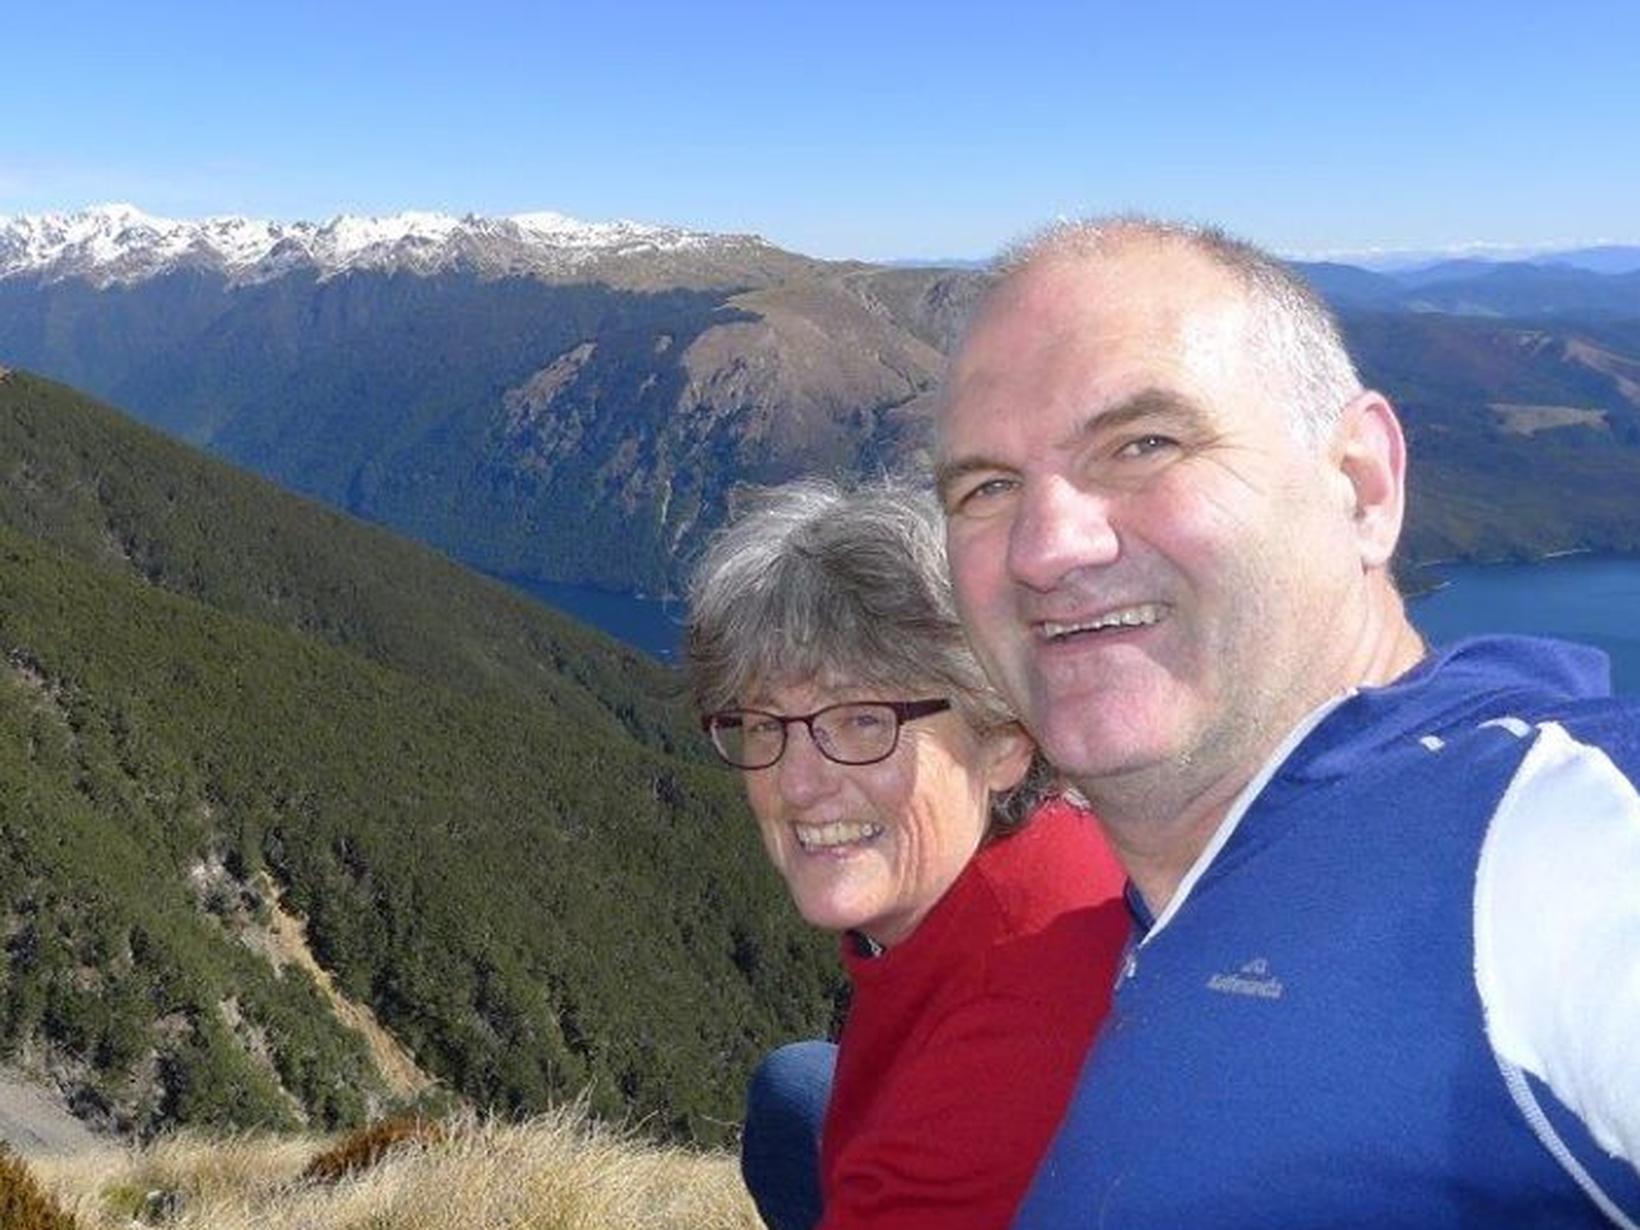 Joy & Wayne from Blenheim, New Zealand